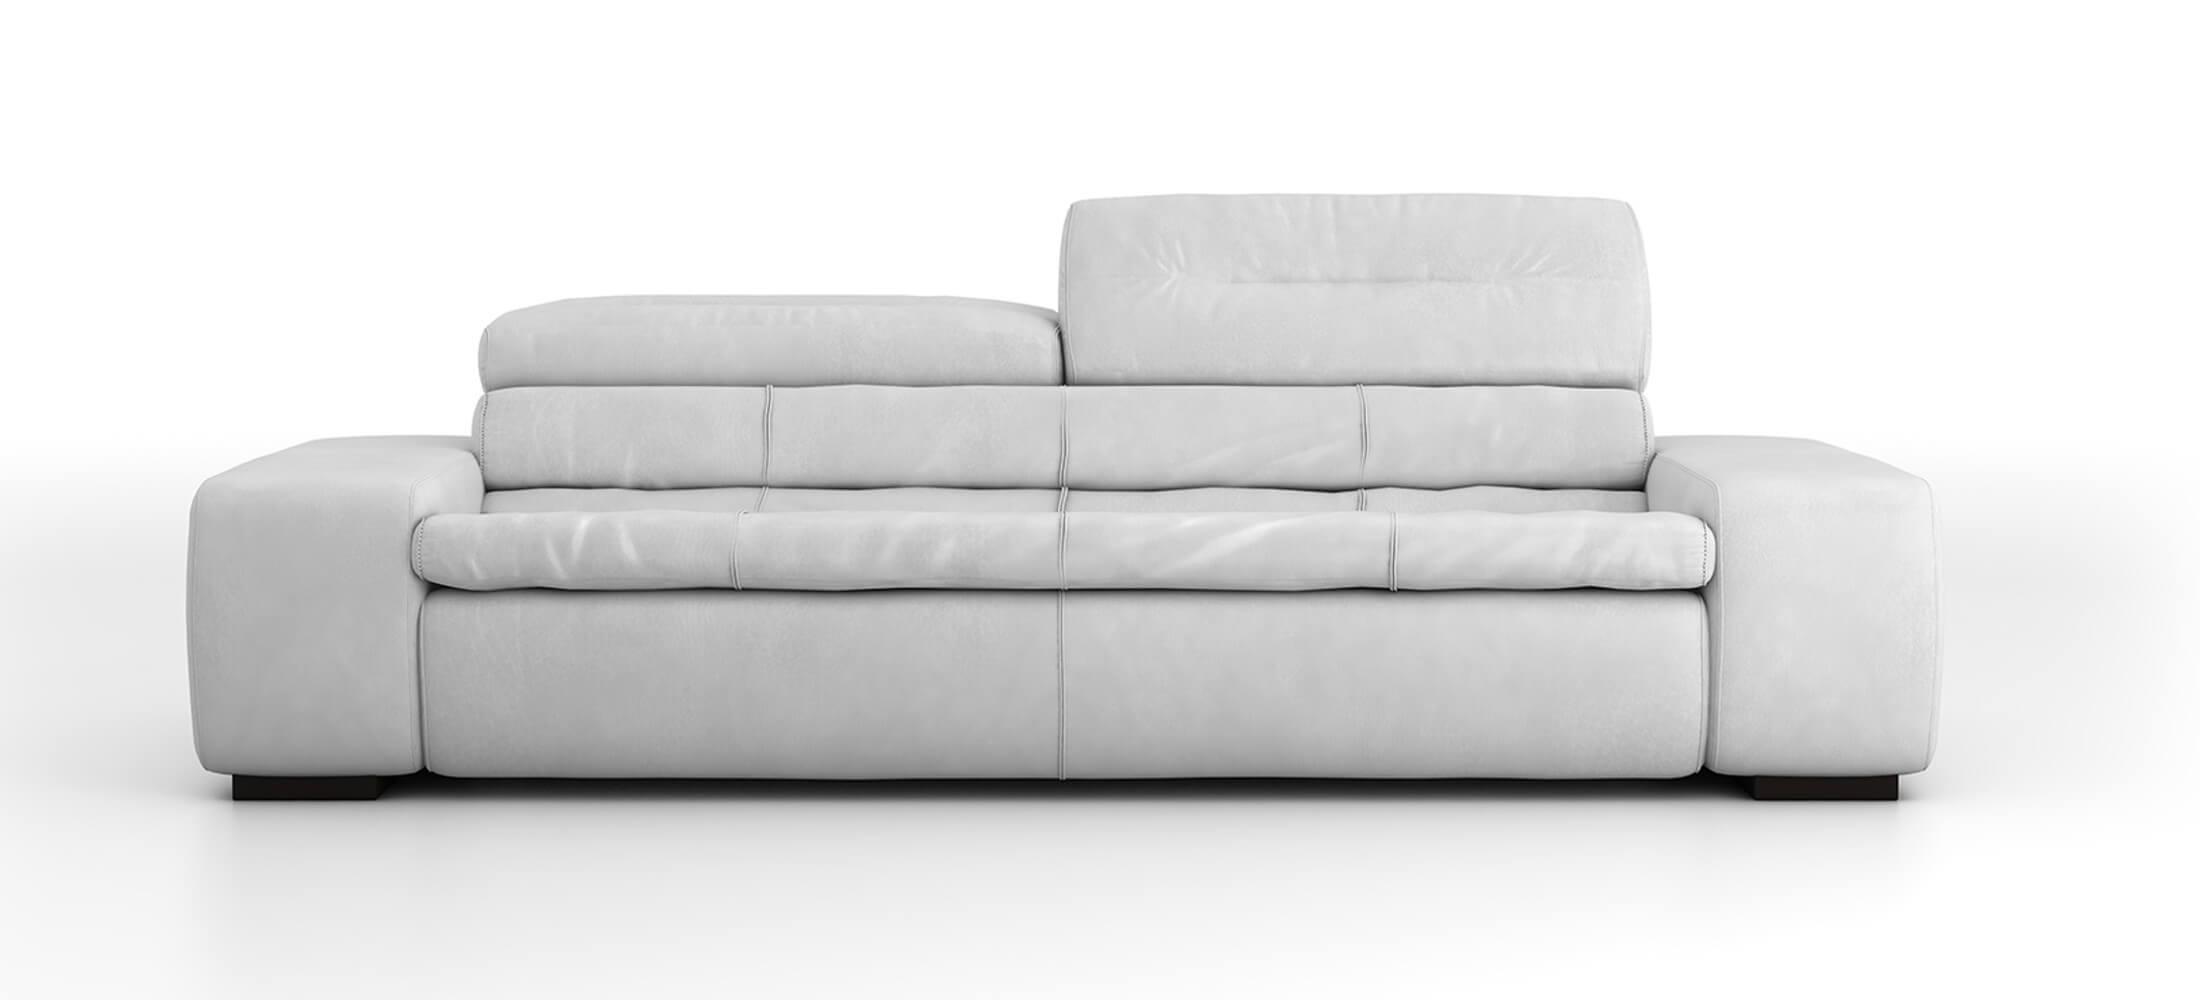 Sofá kobe